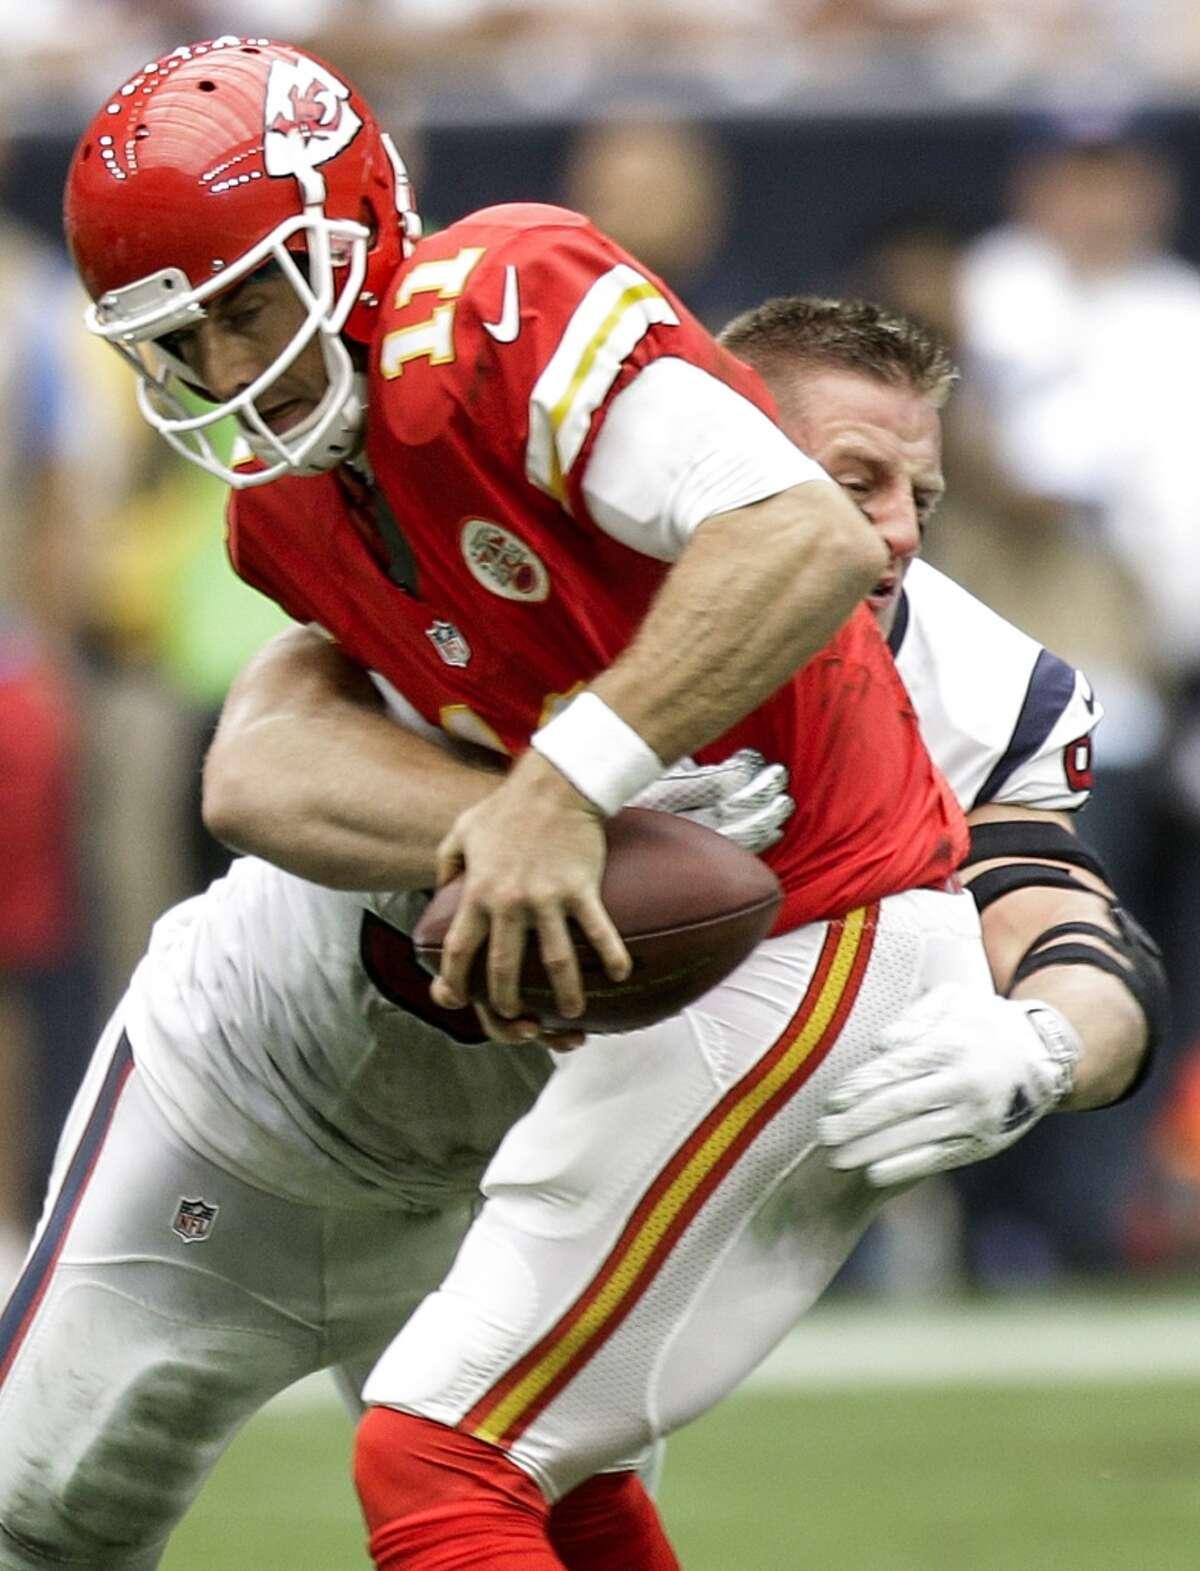 Houston Texans defensive end J.J. Watt (99) sacks Kansas City Chiefs quarterback Alex Smith (11) during the second quarter of an NFL football game at NRG Stadium on Sunday, Sept. 13, 2015, in Houston. ( Brett Coomer / Houston Chronicle )